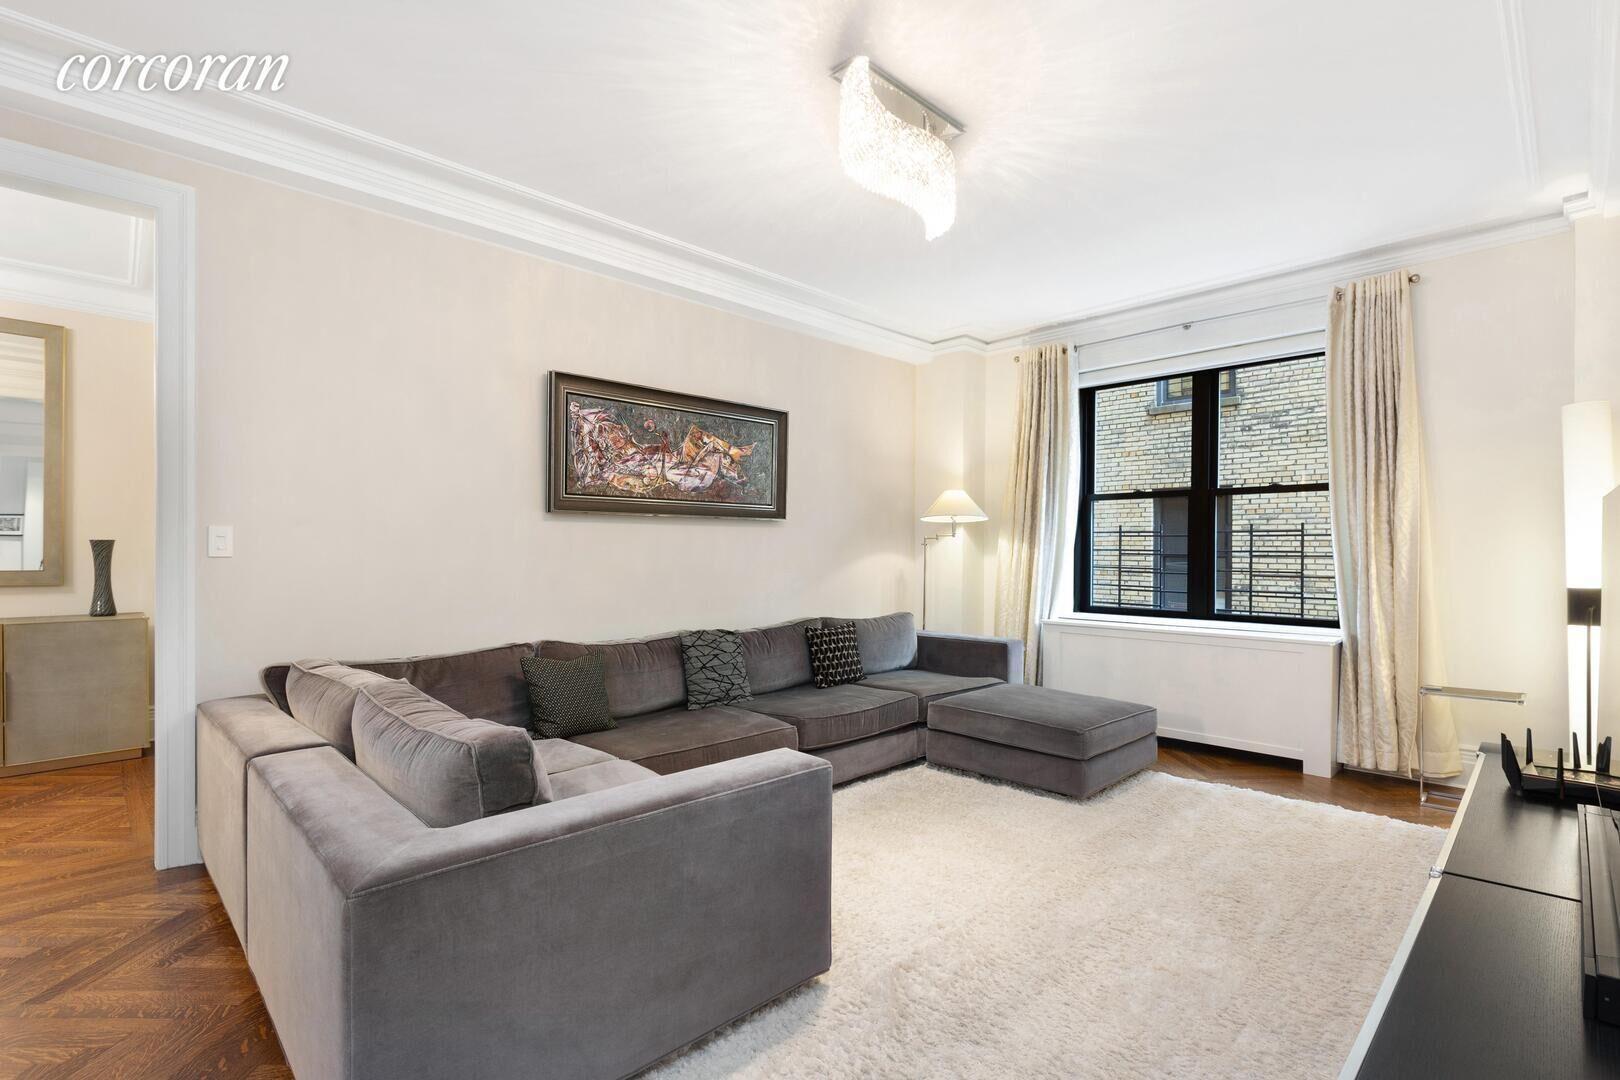 Apartment for sale at 905 West End Avenue, Apt 44